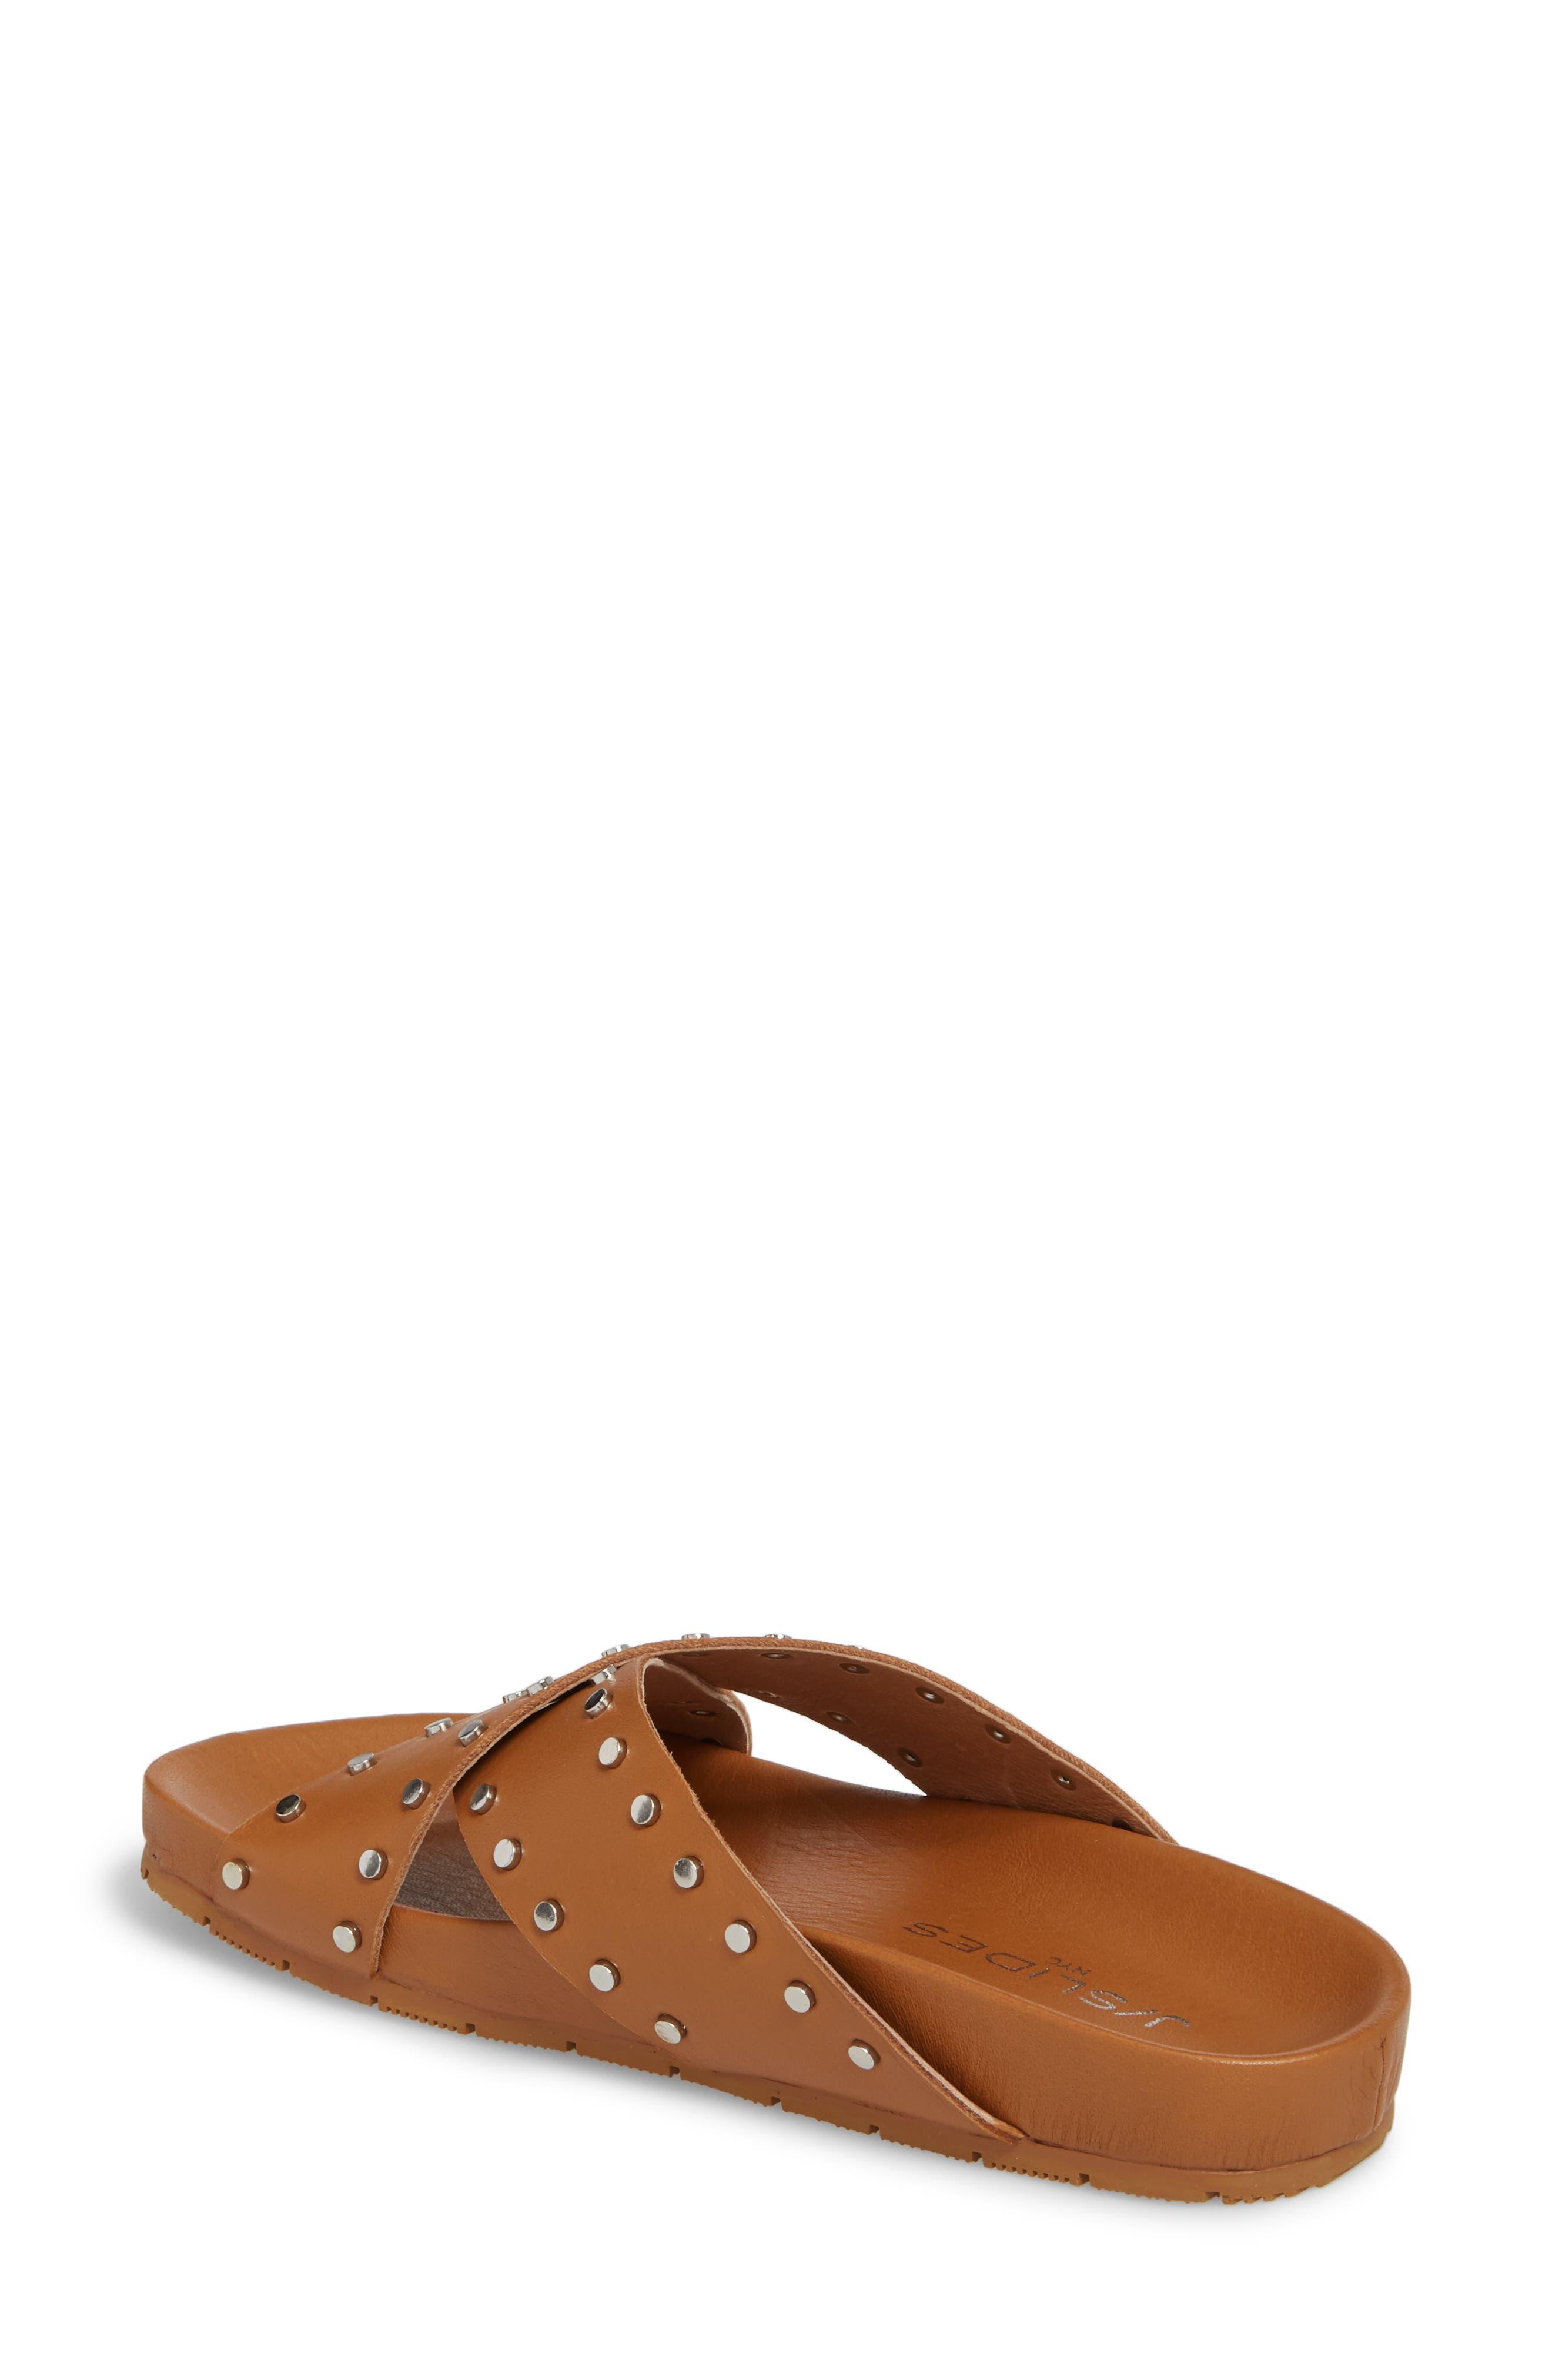 Ellie Studded Slide Sandal,                             Alternate thumbnail 2, color,                             Tan Leather